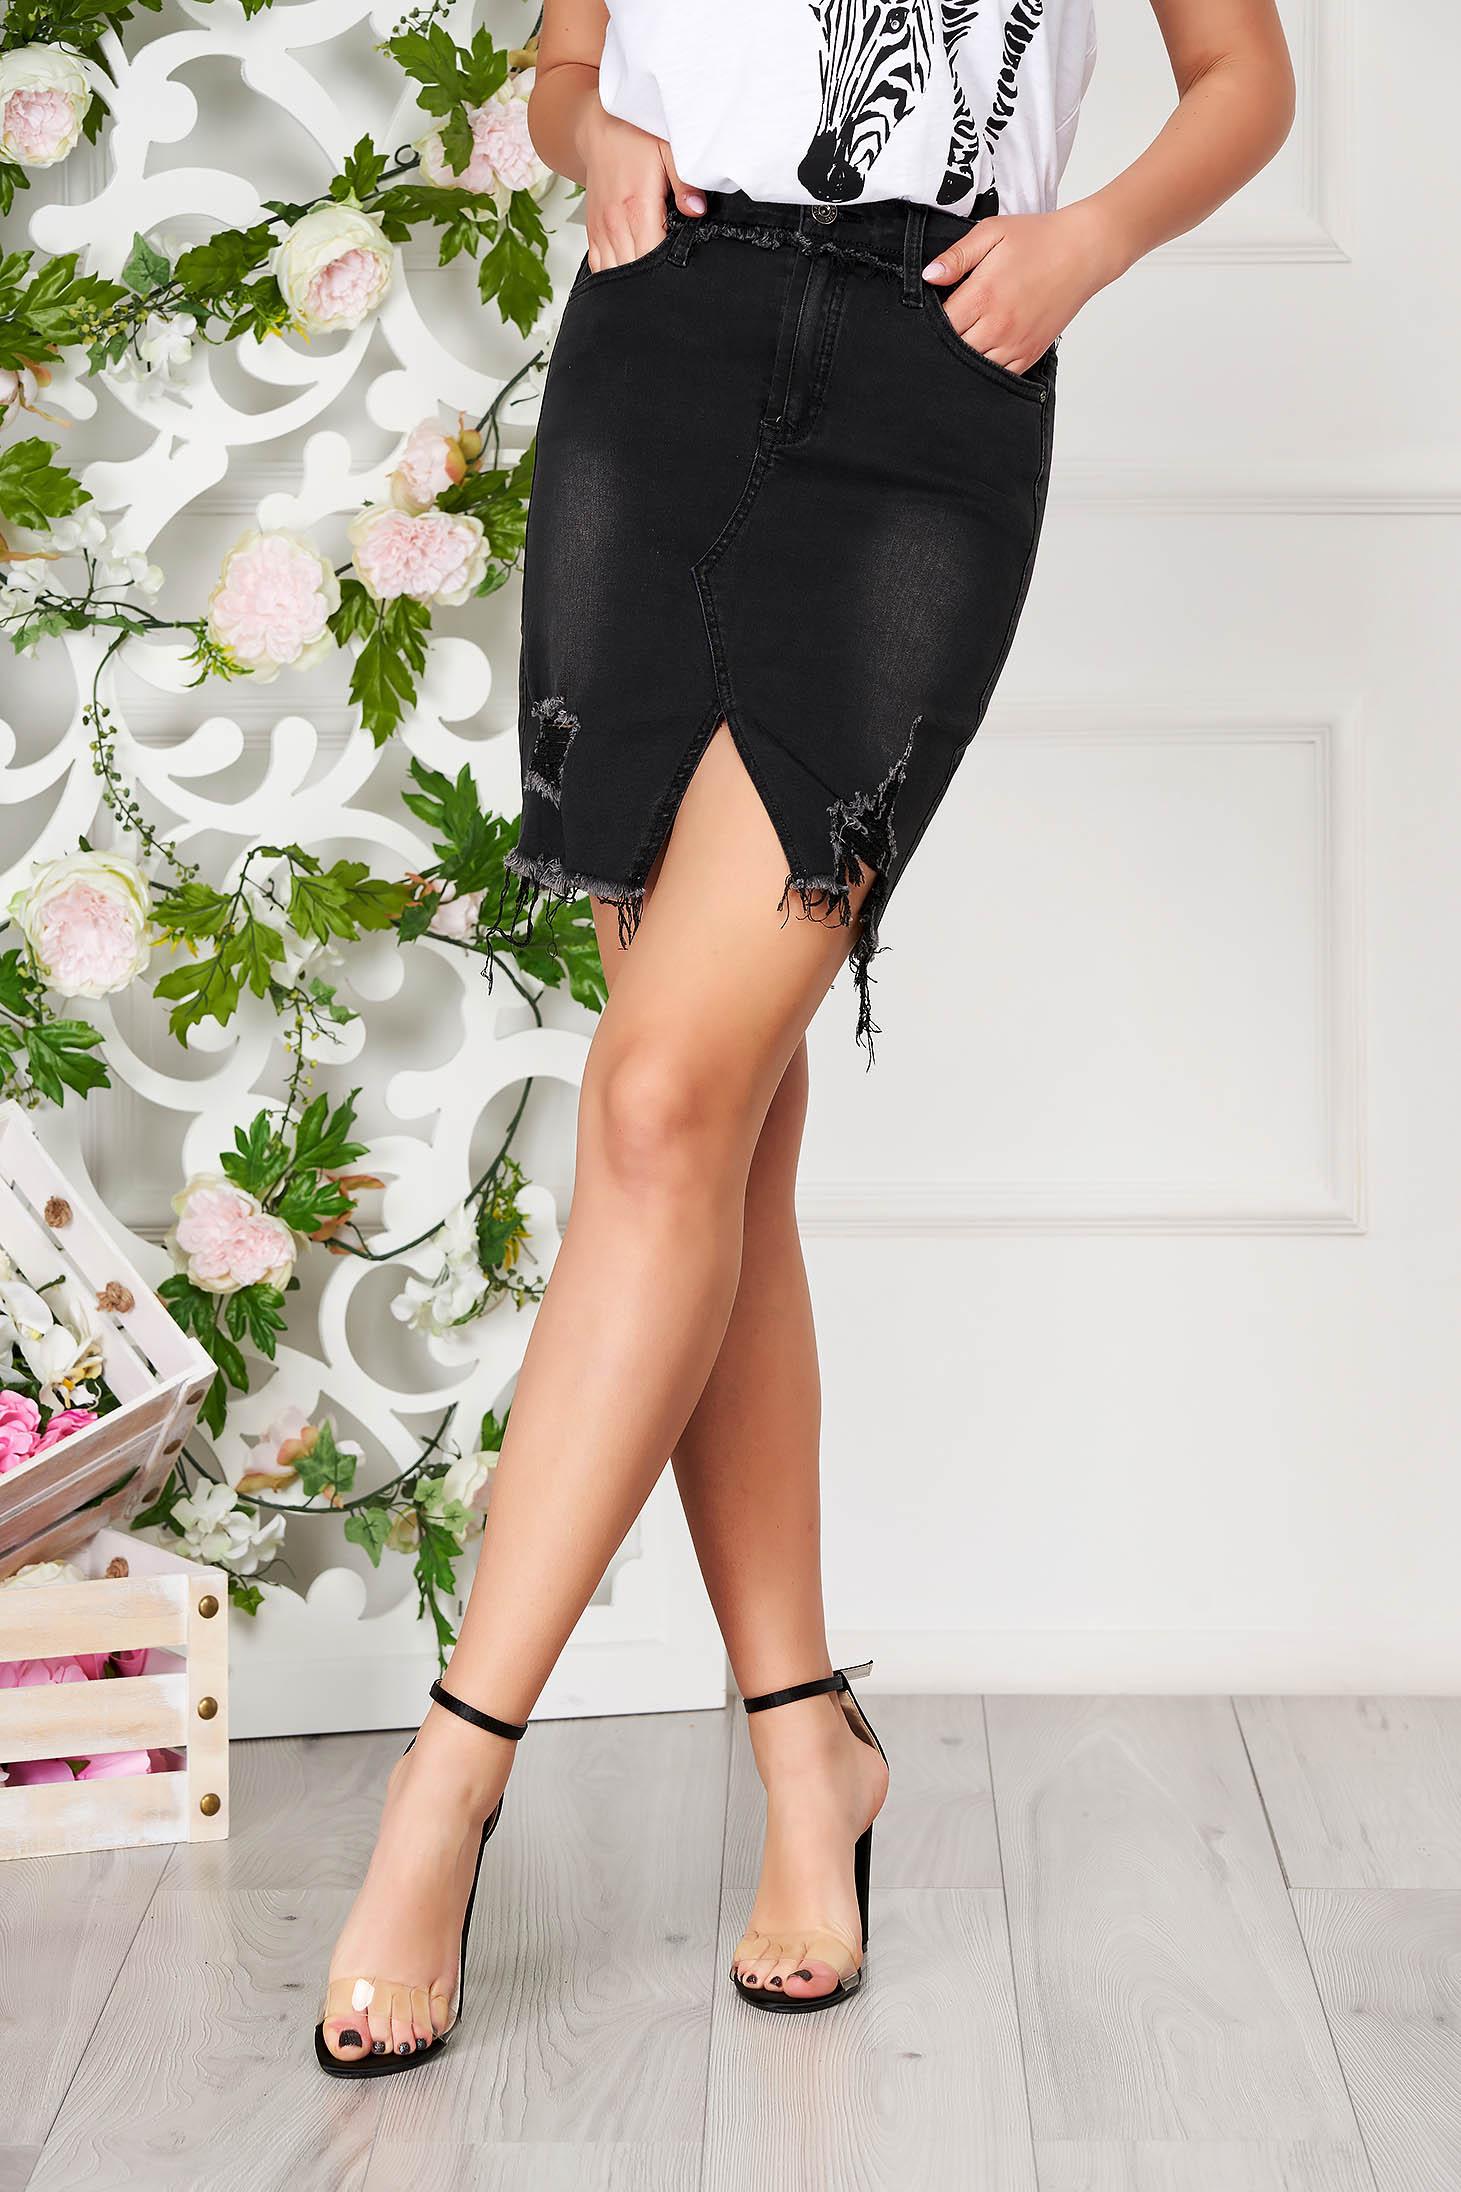 Black skirt denim ripped casual high waisted short cut pencil